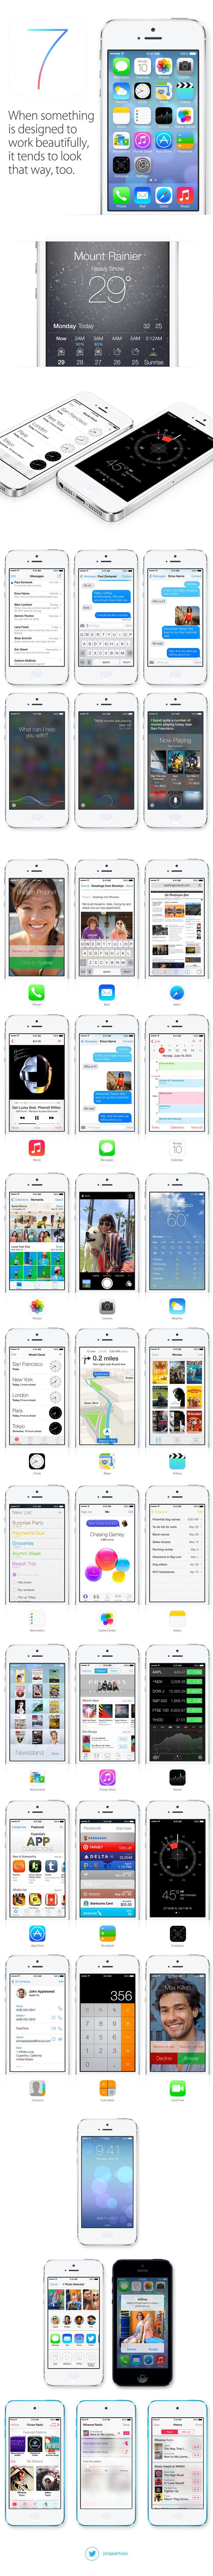 Apple iOS7 - new flat design *** #ios #apple #gui #ui